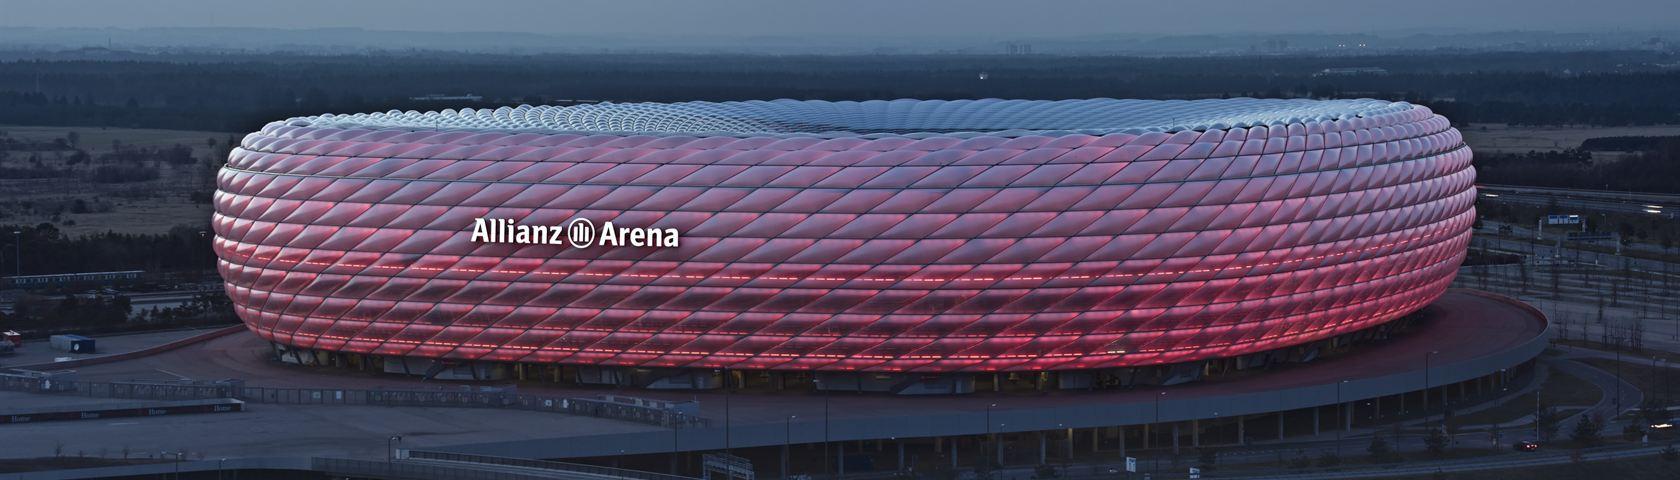 Allianz Arena Twilight